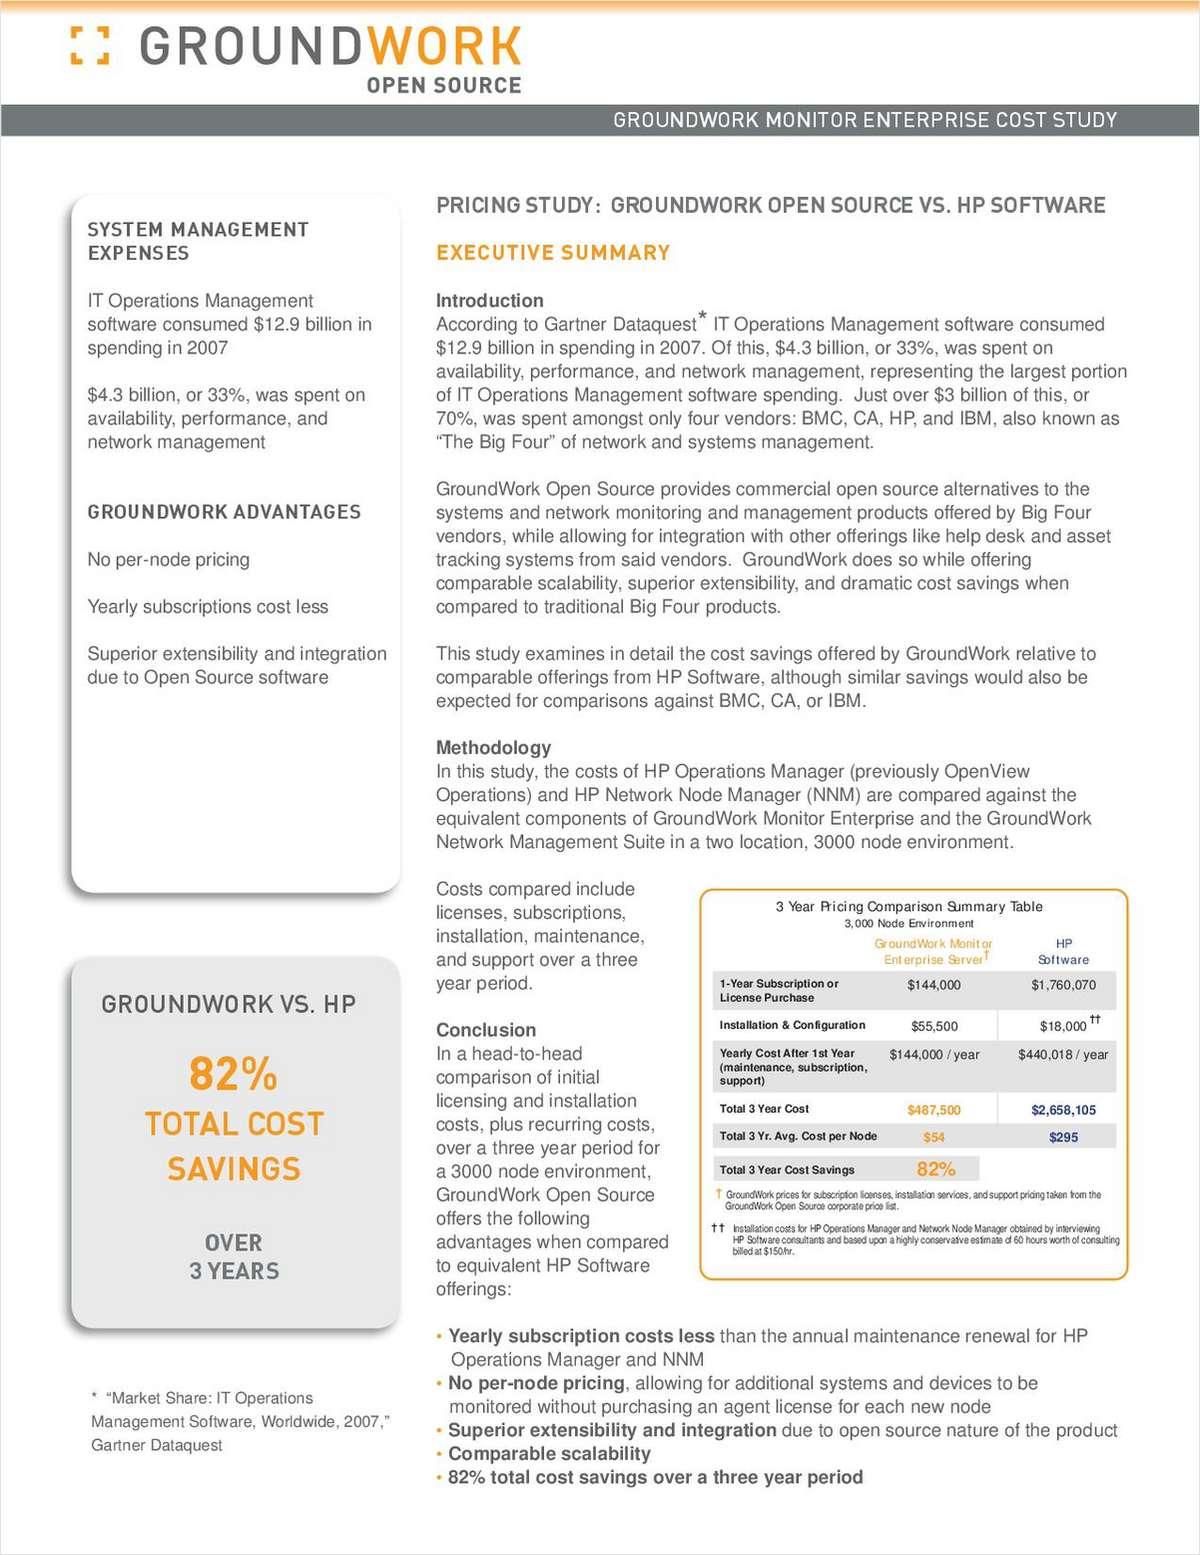 HPOV vs. GroundWork Monitor Enterprise